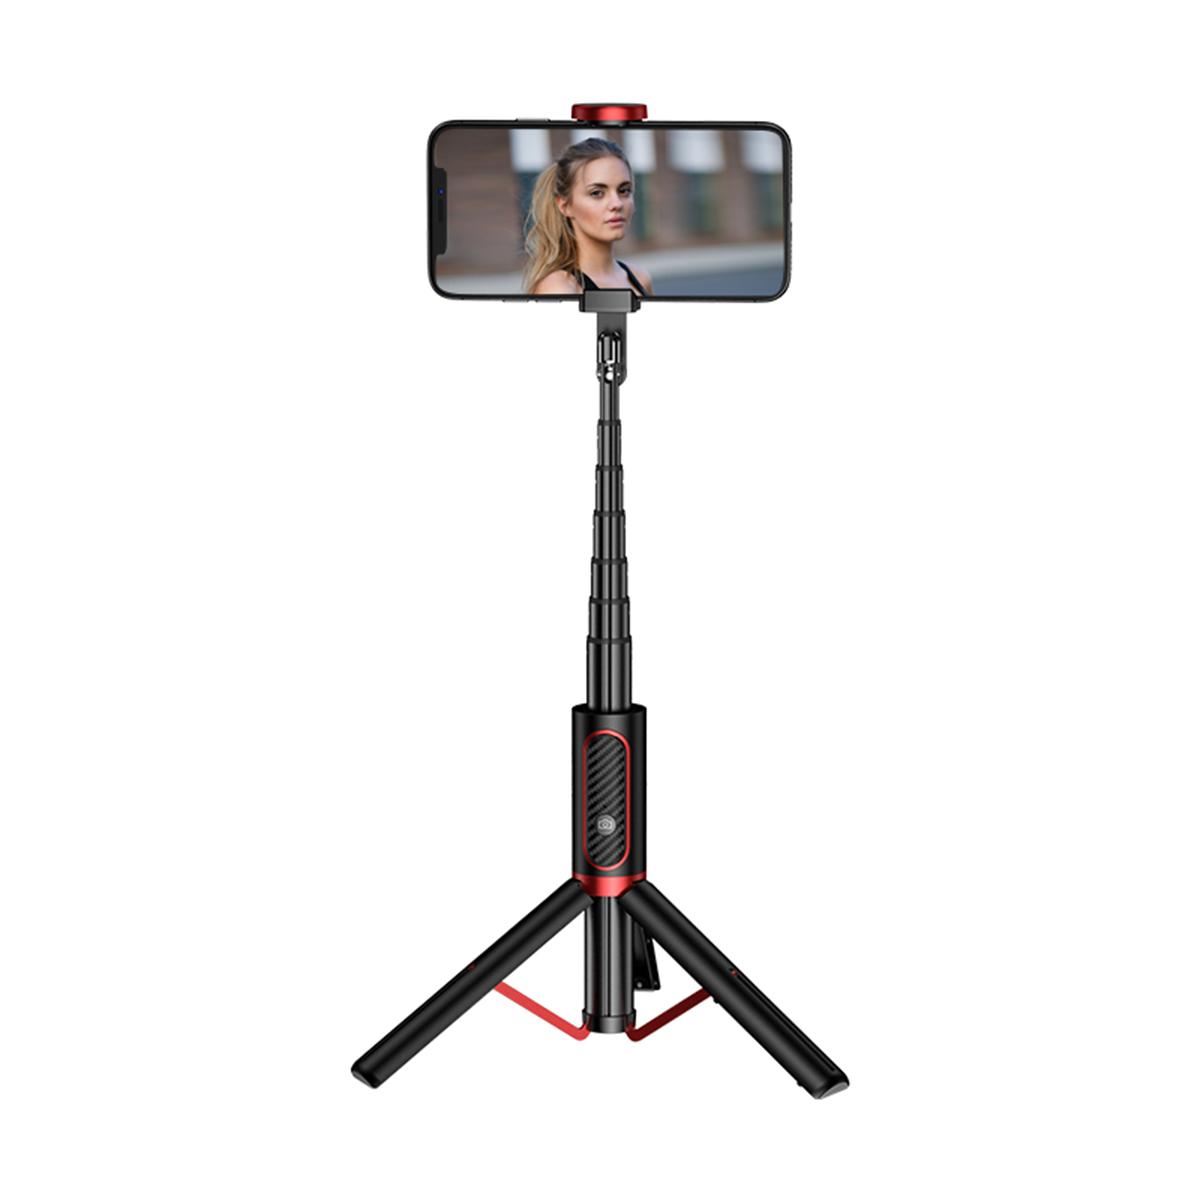 globostar-87330-jr-oth-ab202-asirmato-wireless-bluetooth-v50-selfie-stick-mauro